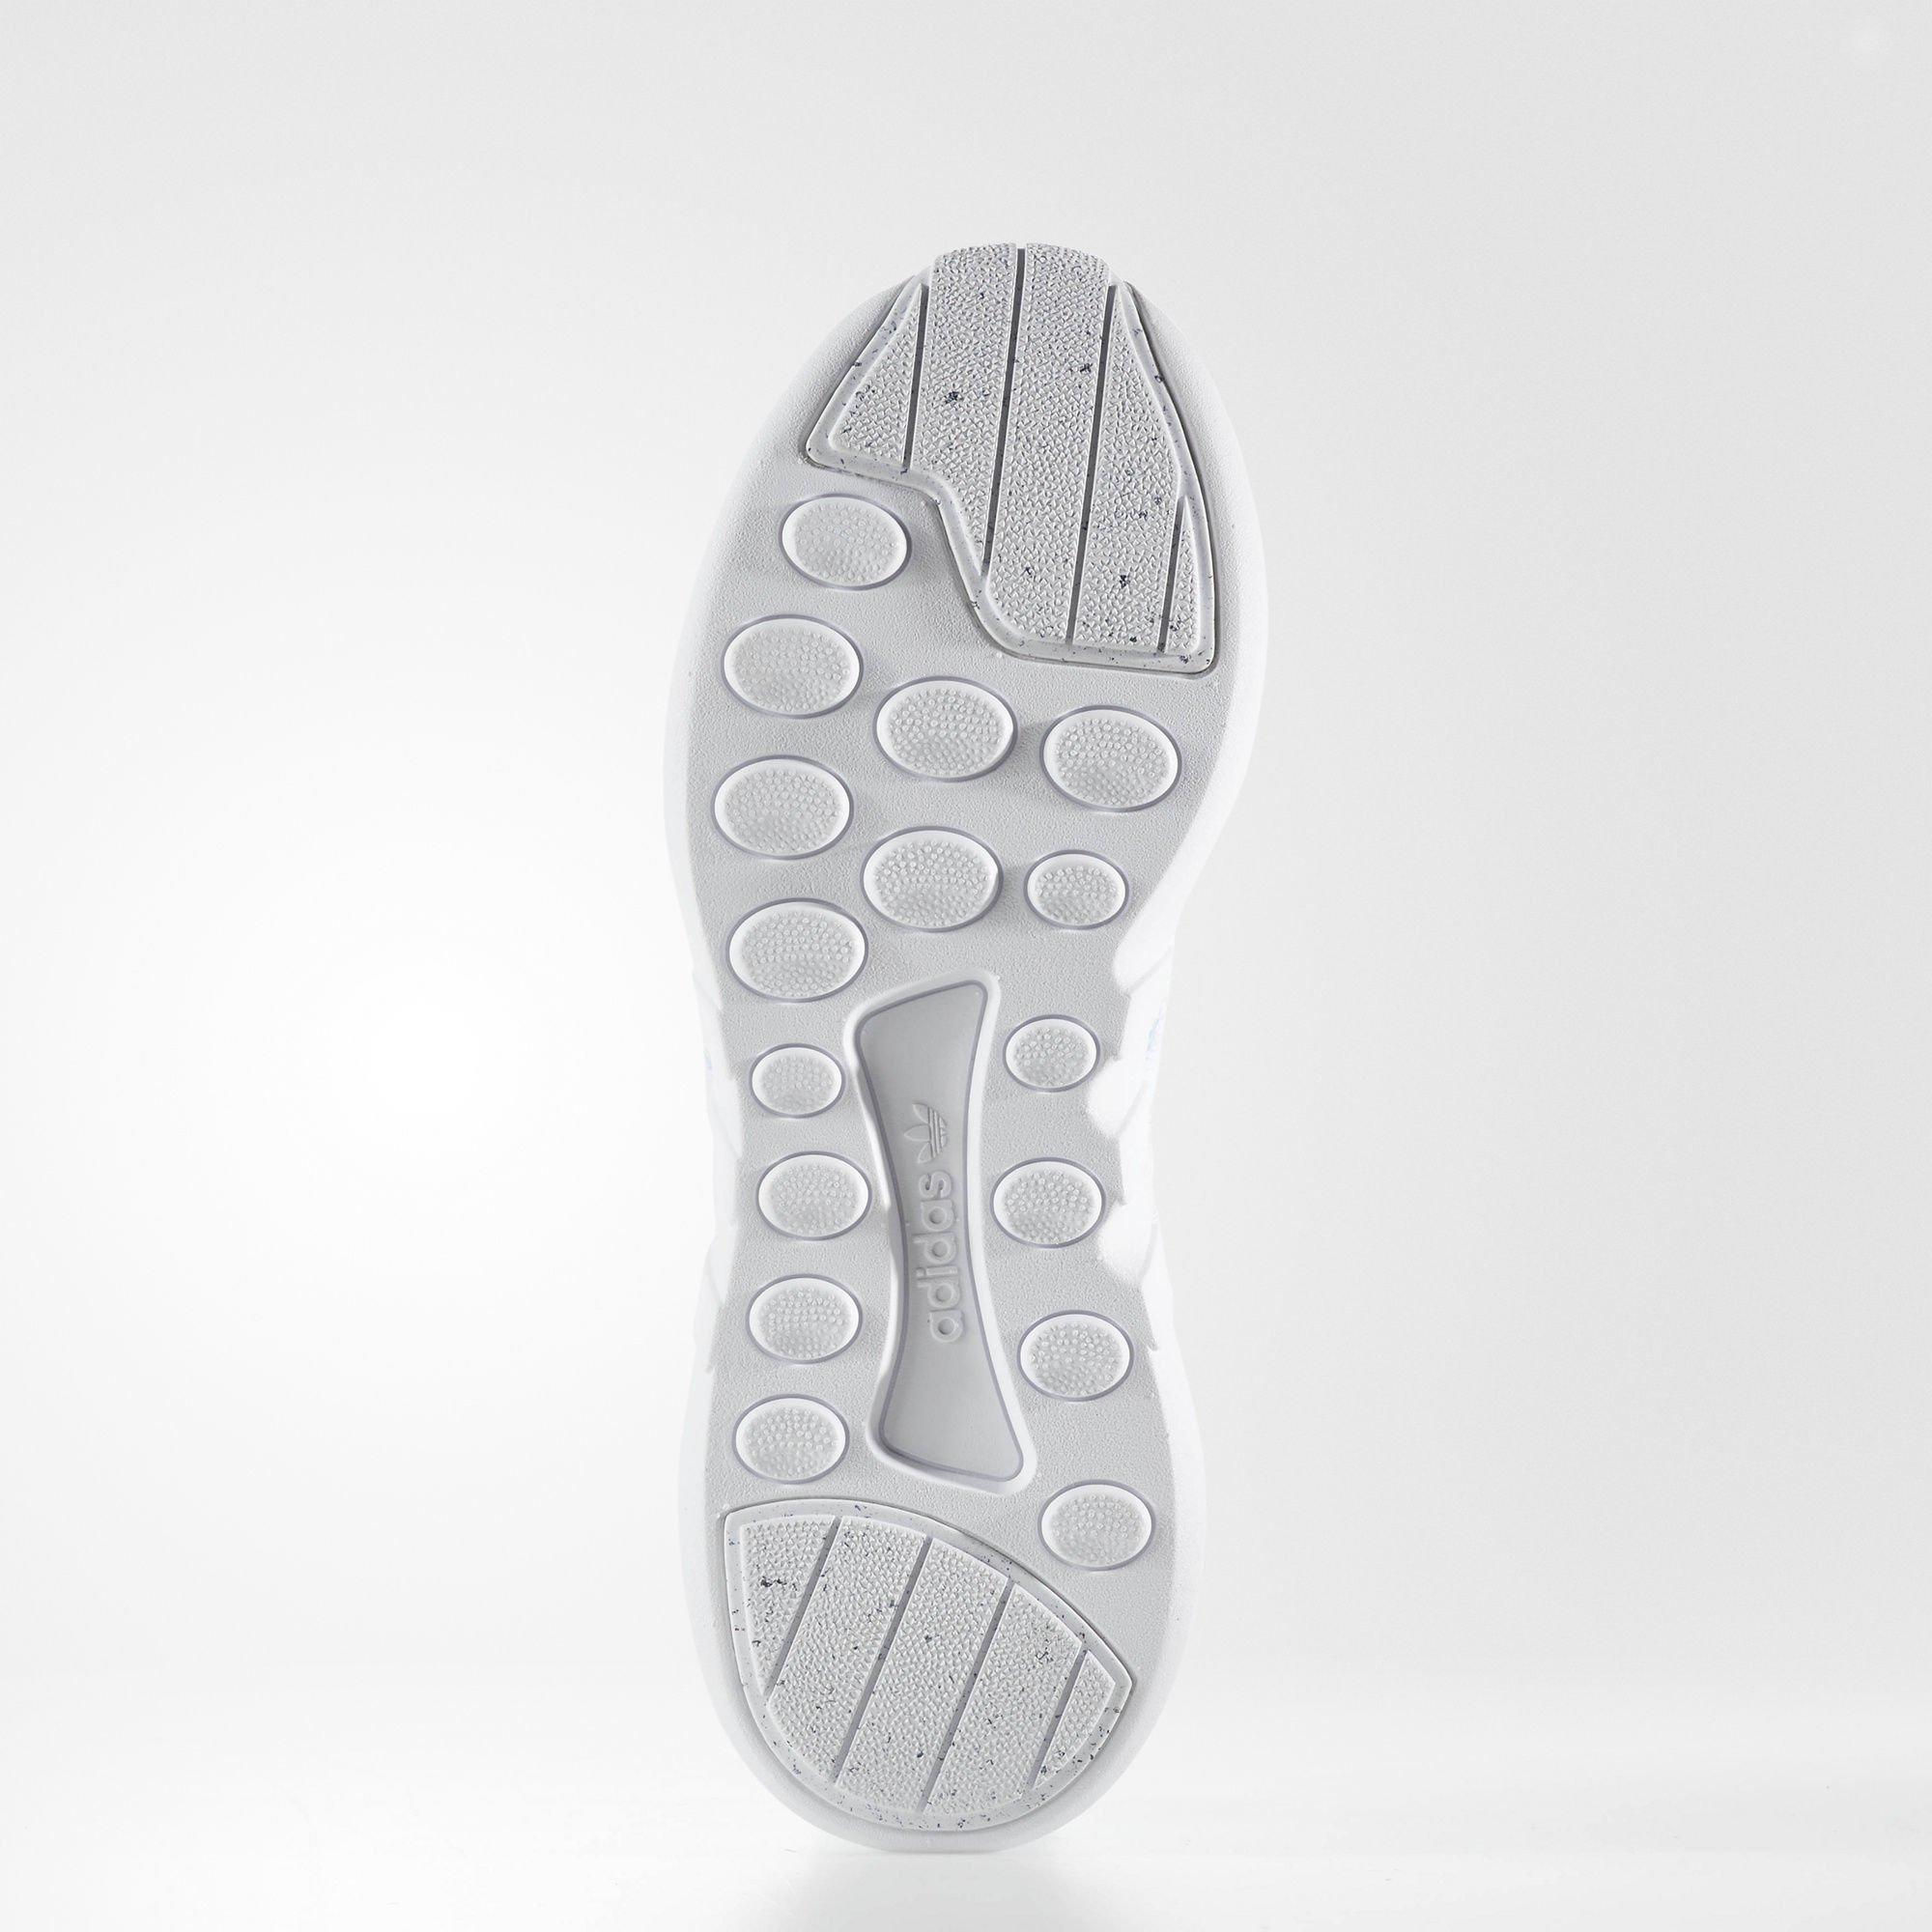 Adidas EQT Support ADV AC7804